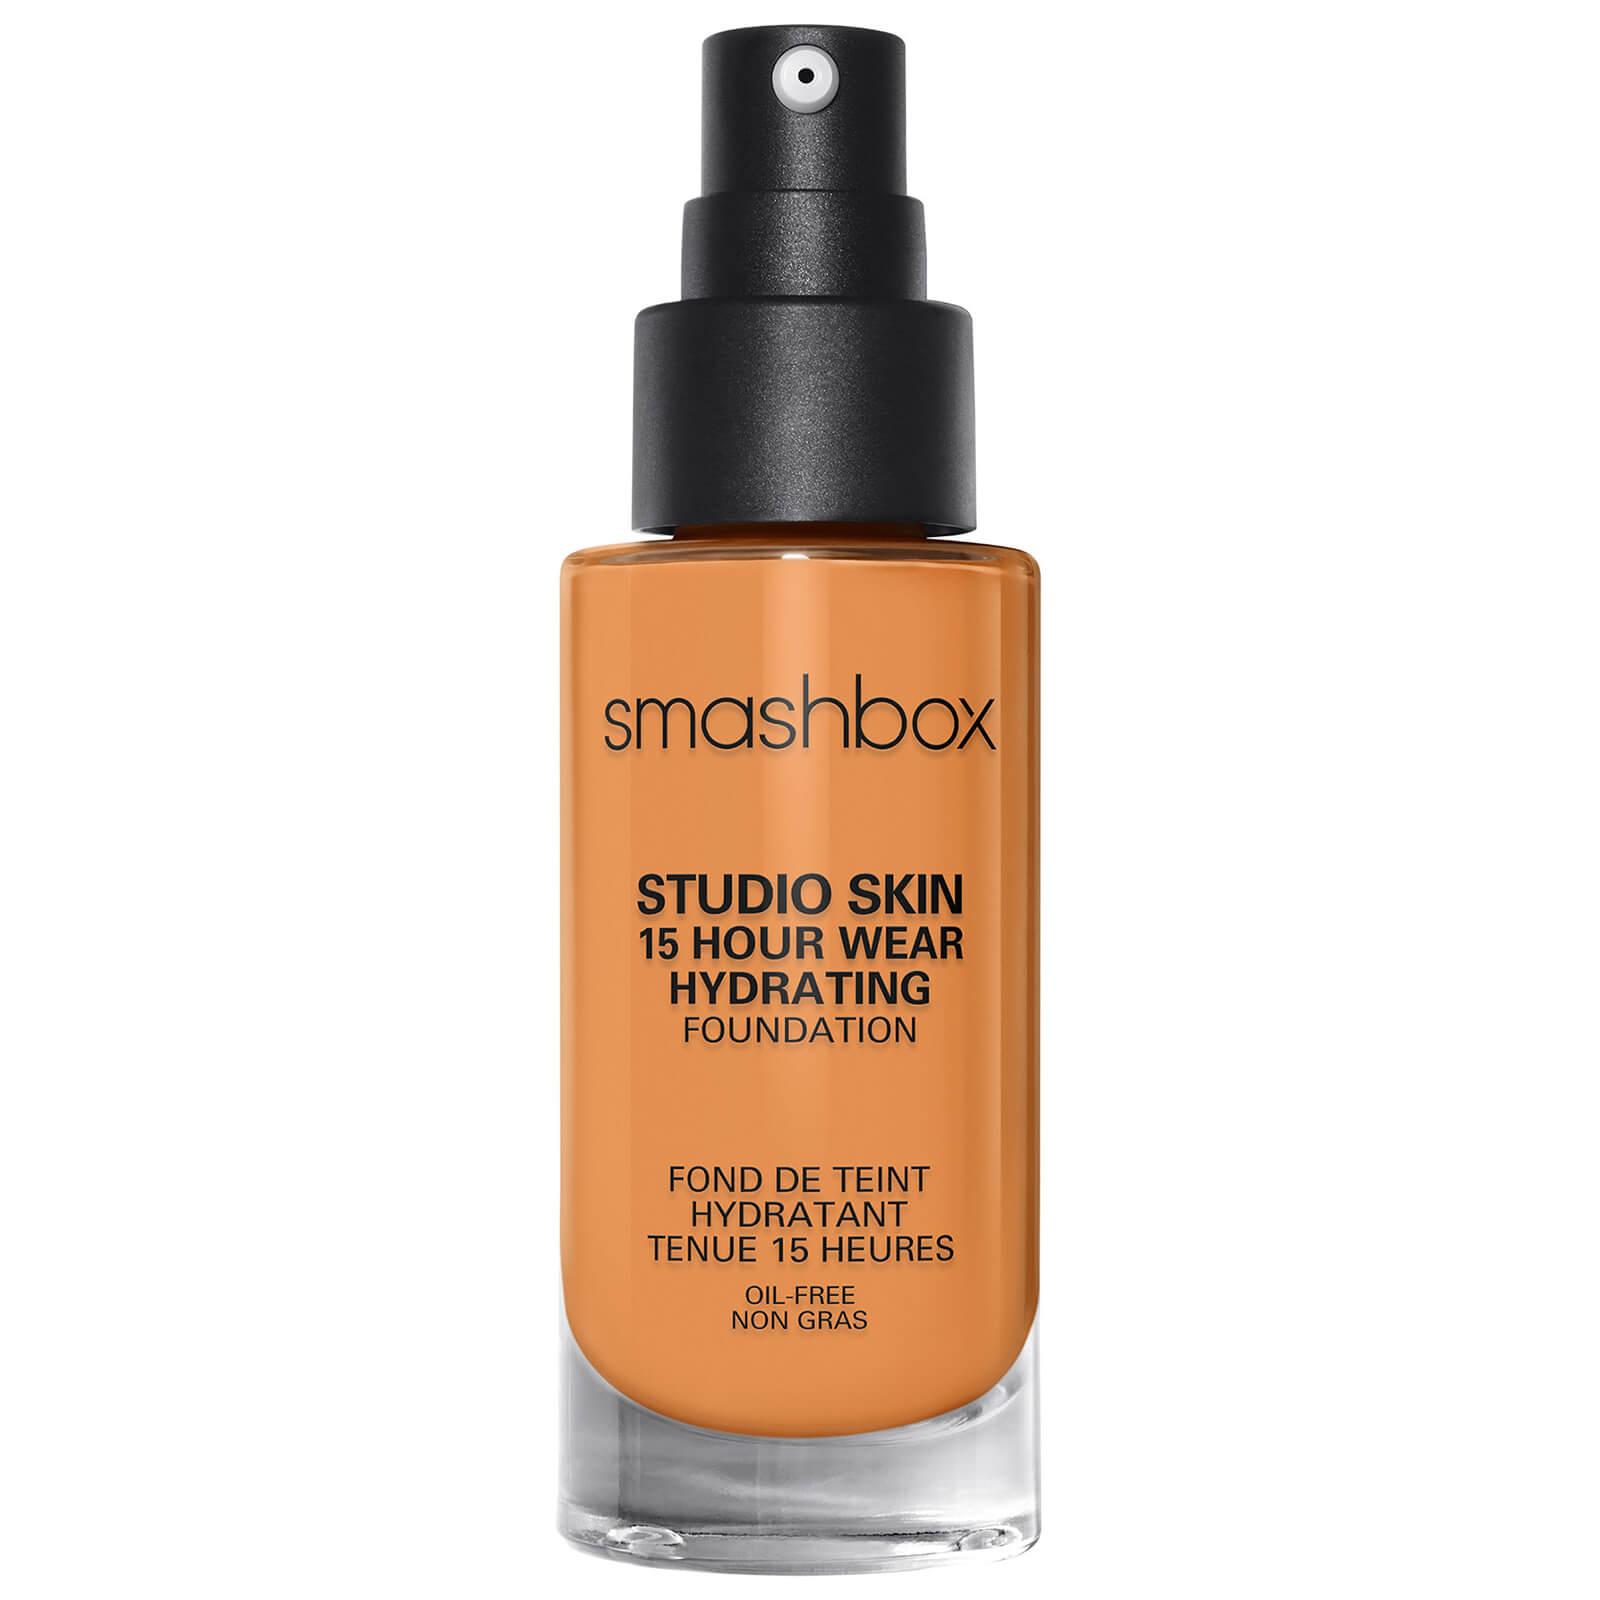 Smashbox Fond de Teint Hydratant 15Heures Studio Skin Smashbox (différentes teintes disponibles) - 3.35